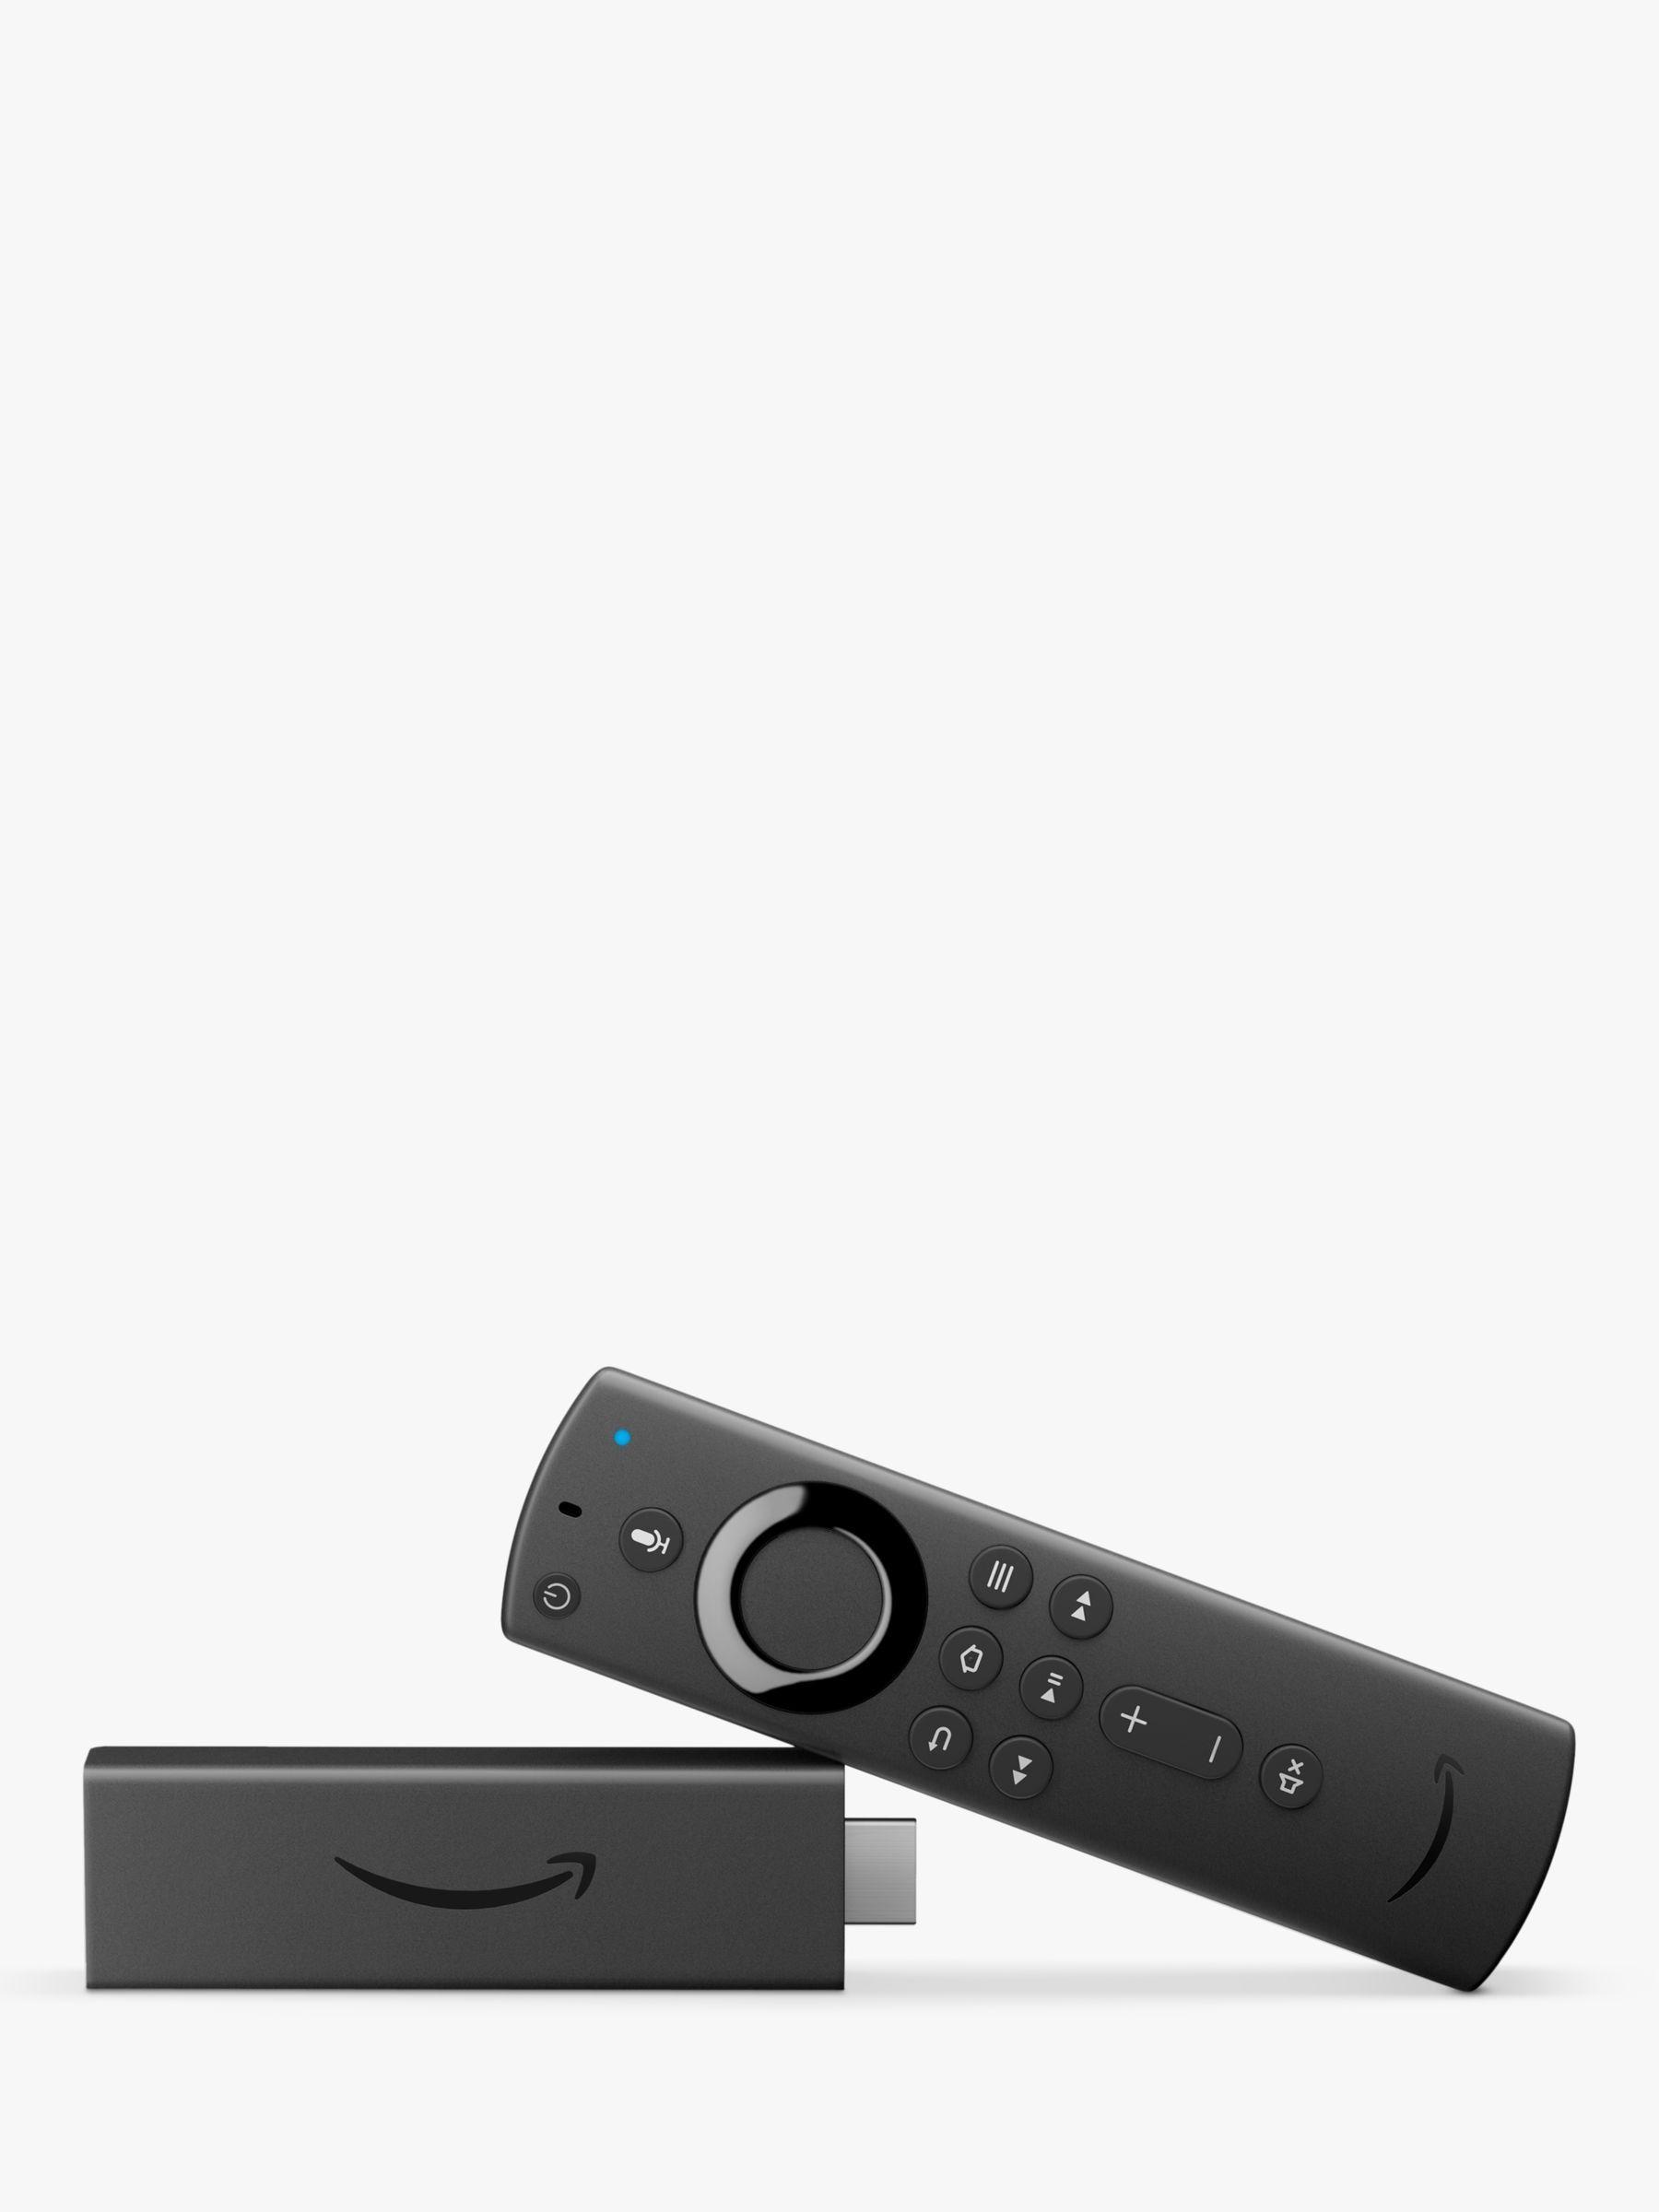 Amazon Fire Tv Stick 4k Ultra Hd With Alexa Voice Remote Amazon Fire Tv Stick Amazon Fire Tv Alexa Voice